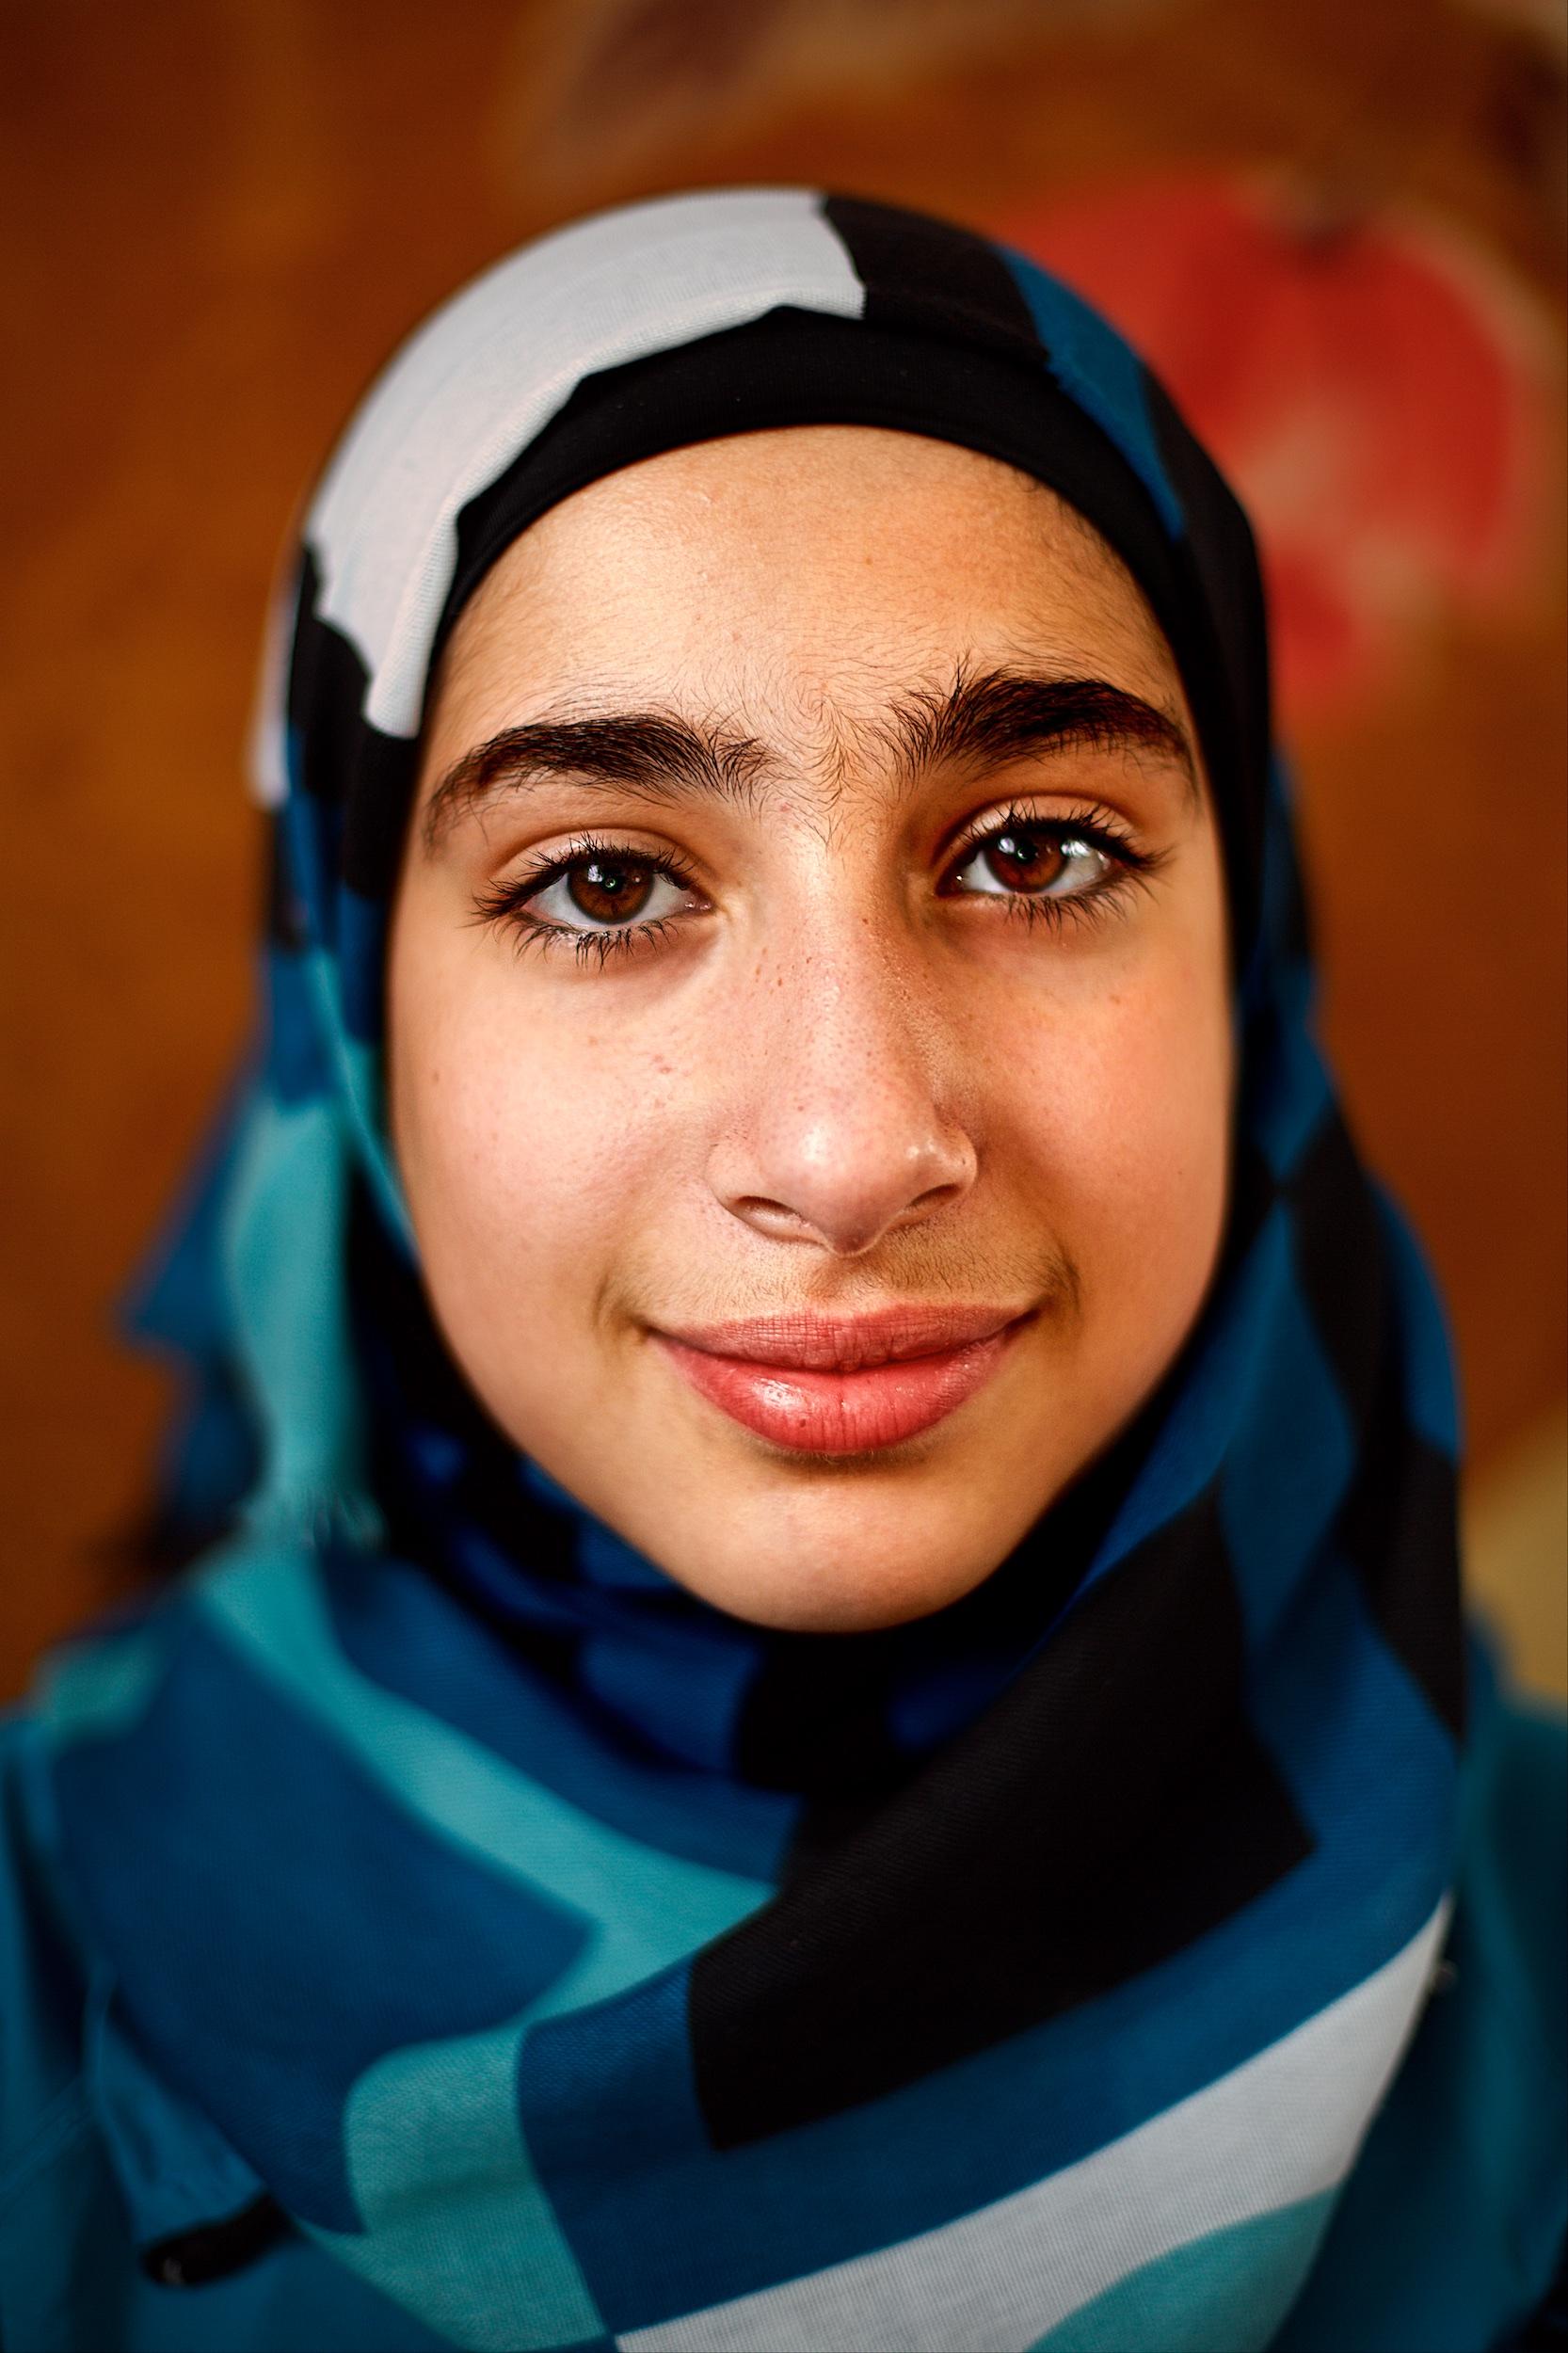 jordan-msf-zaatari-dectors-without-borders-war-hospital-refugee-camp-denis-bosnic-5.jpg